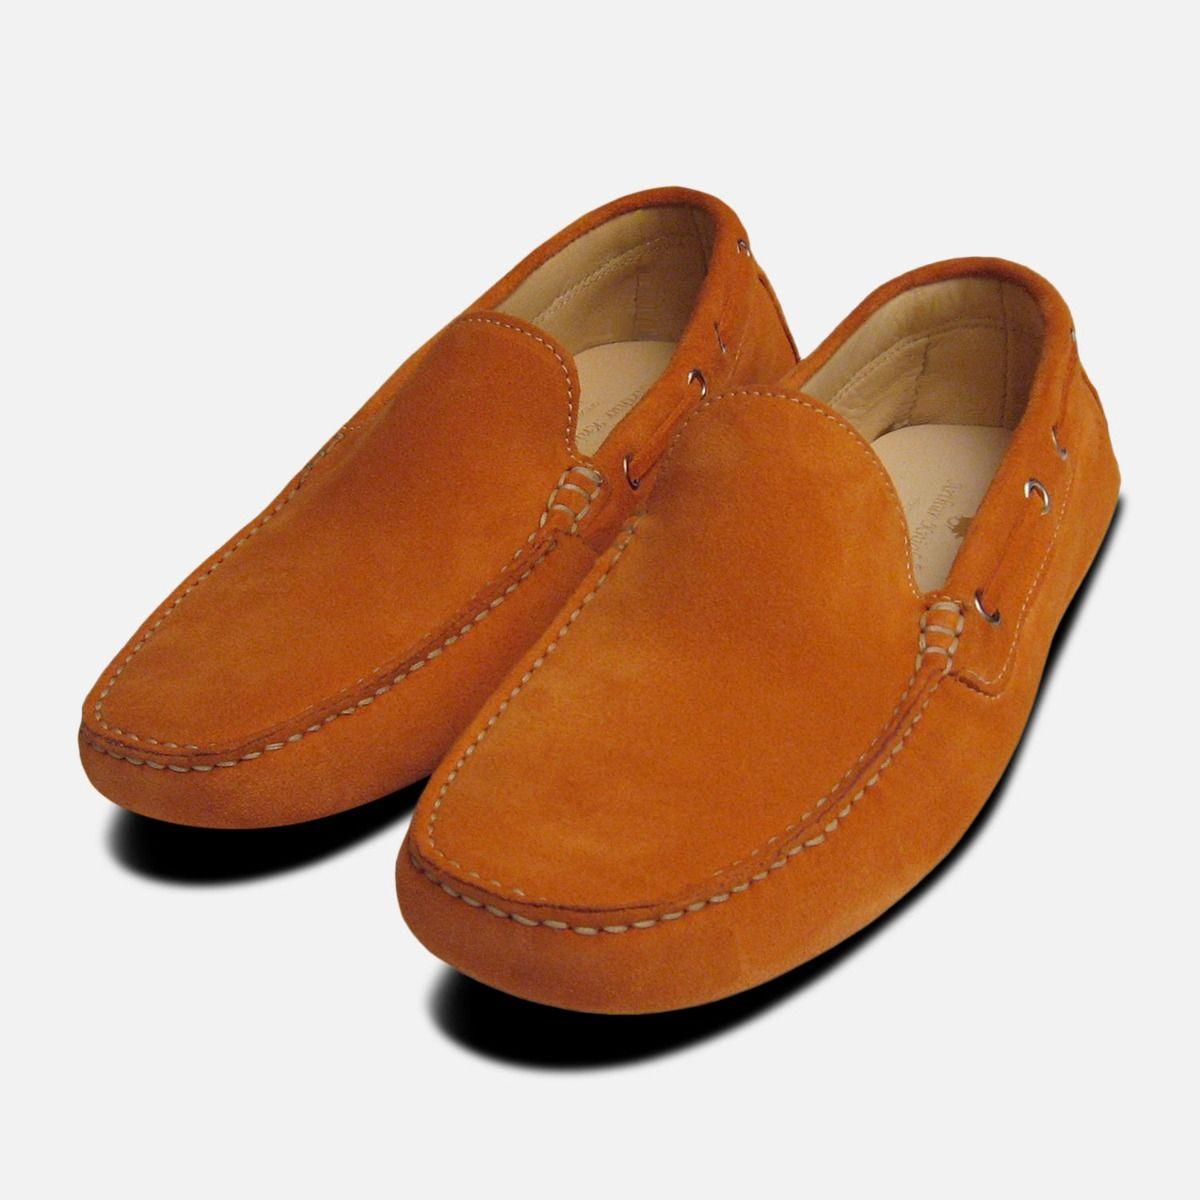 Orange Suede Mens Driving Shoes